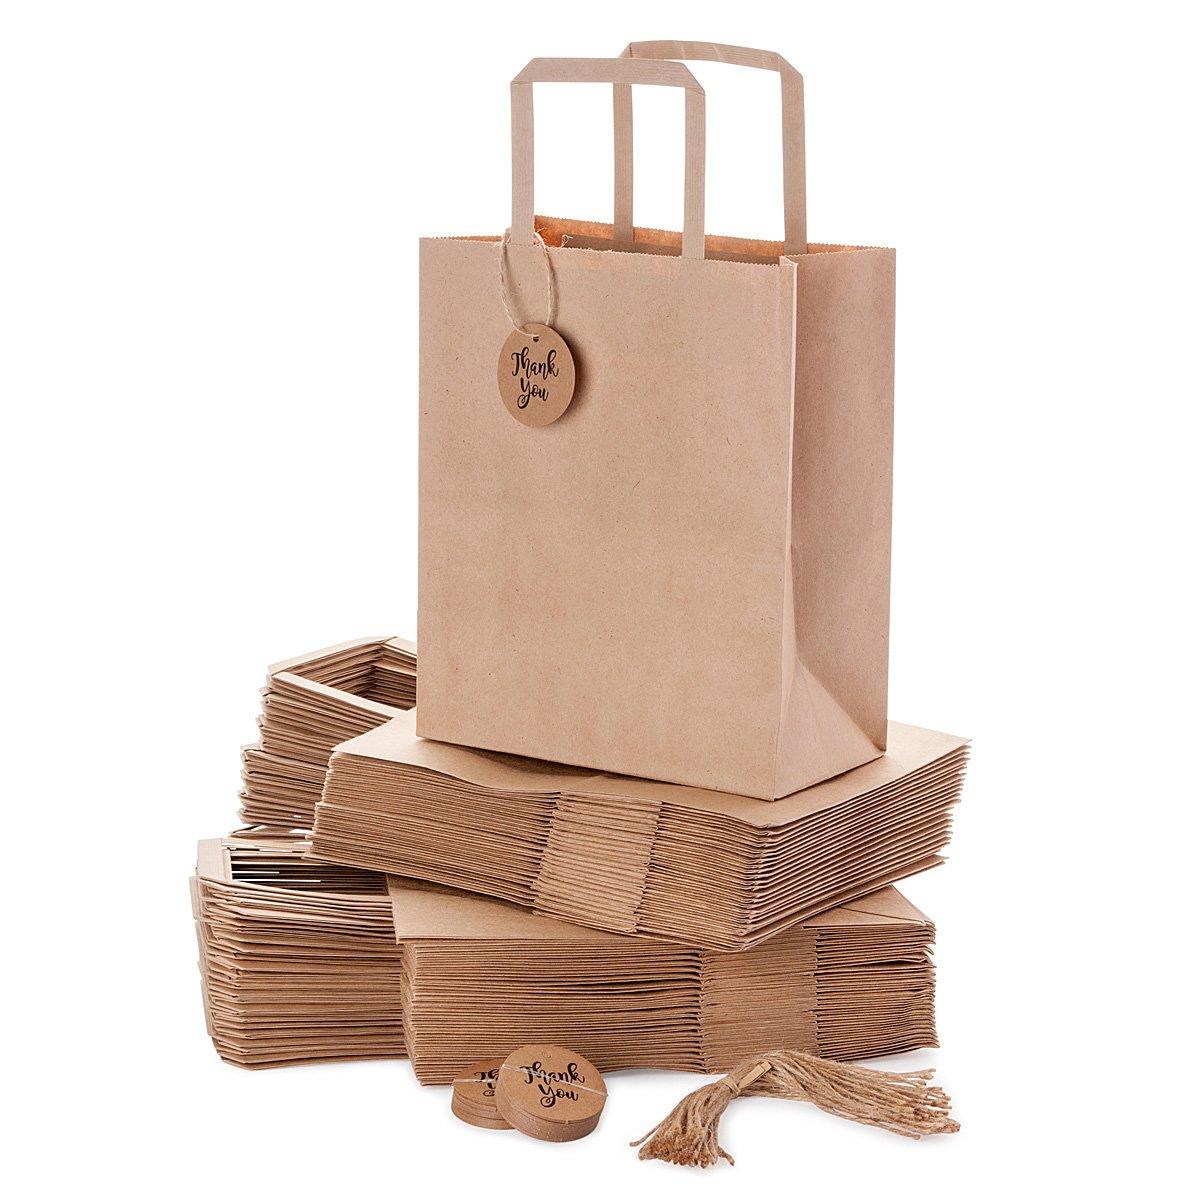 4d16200848 Amazon.com  Kraft Paper Bags Bulk with Handles for Shopping ...